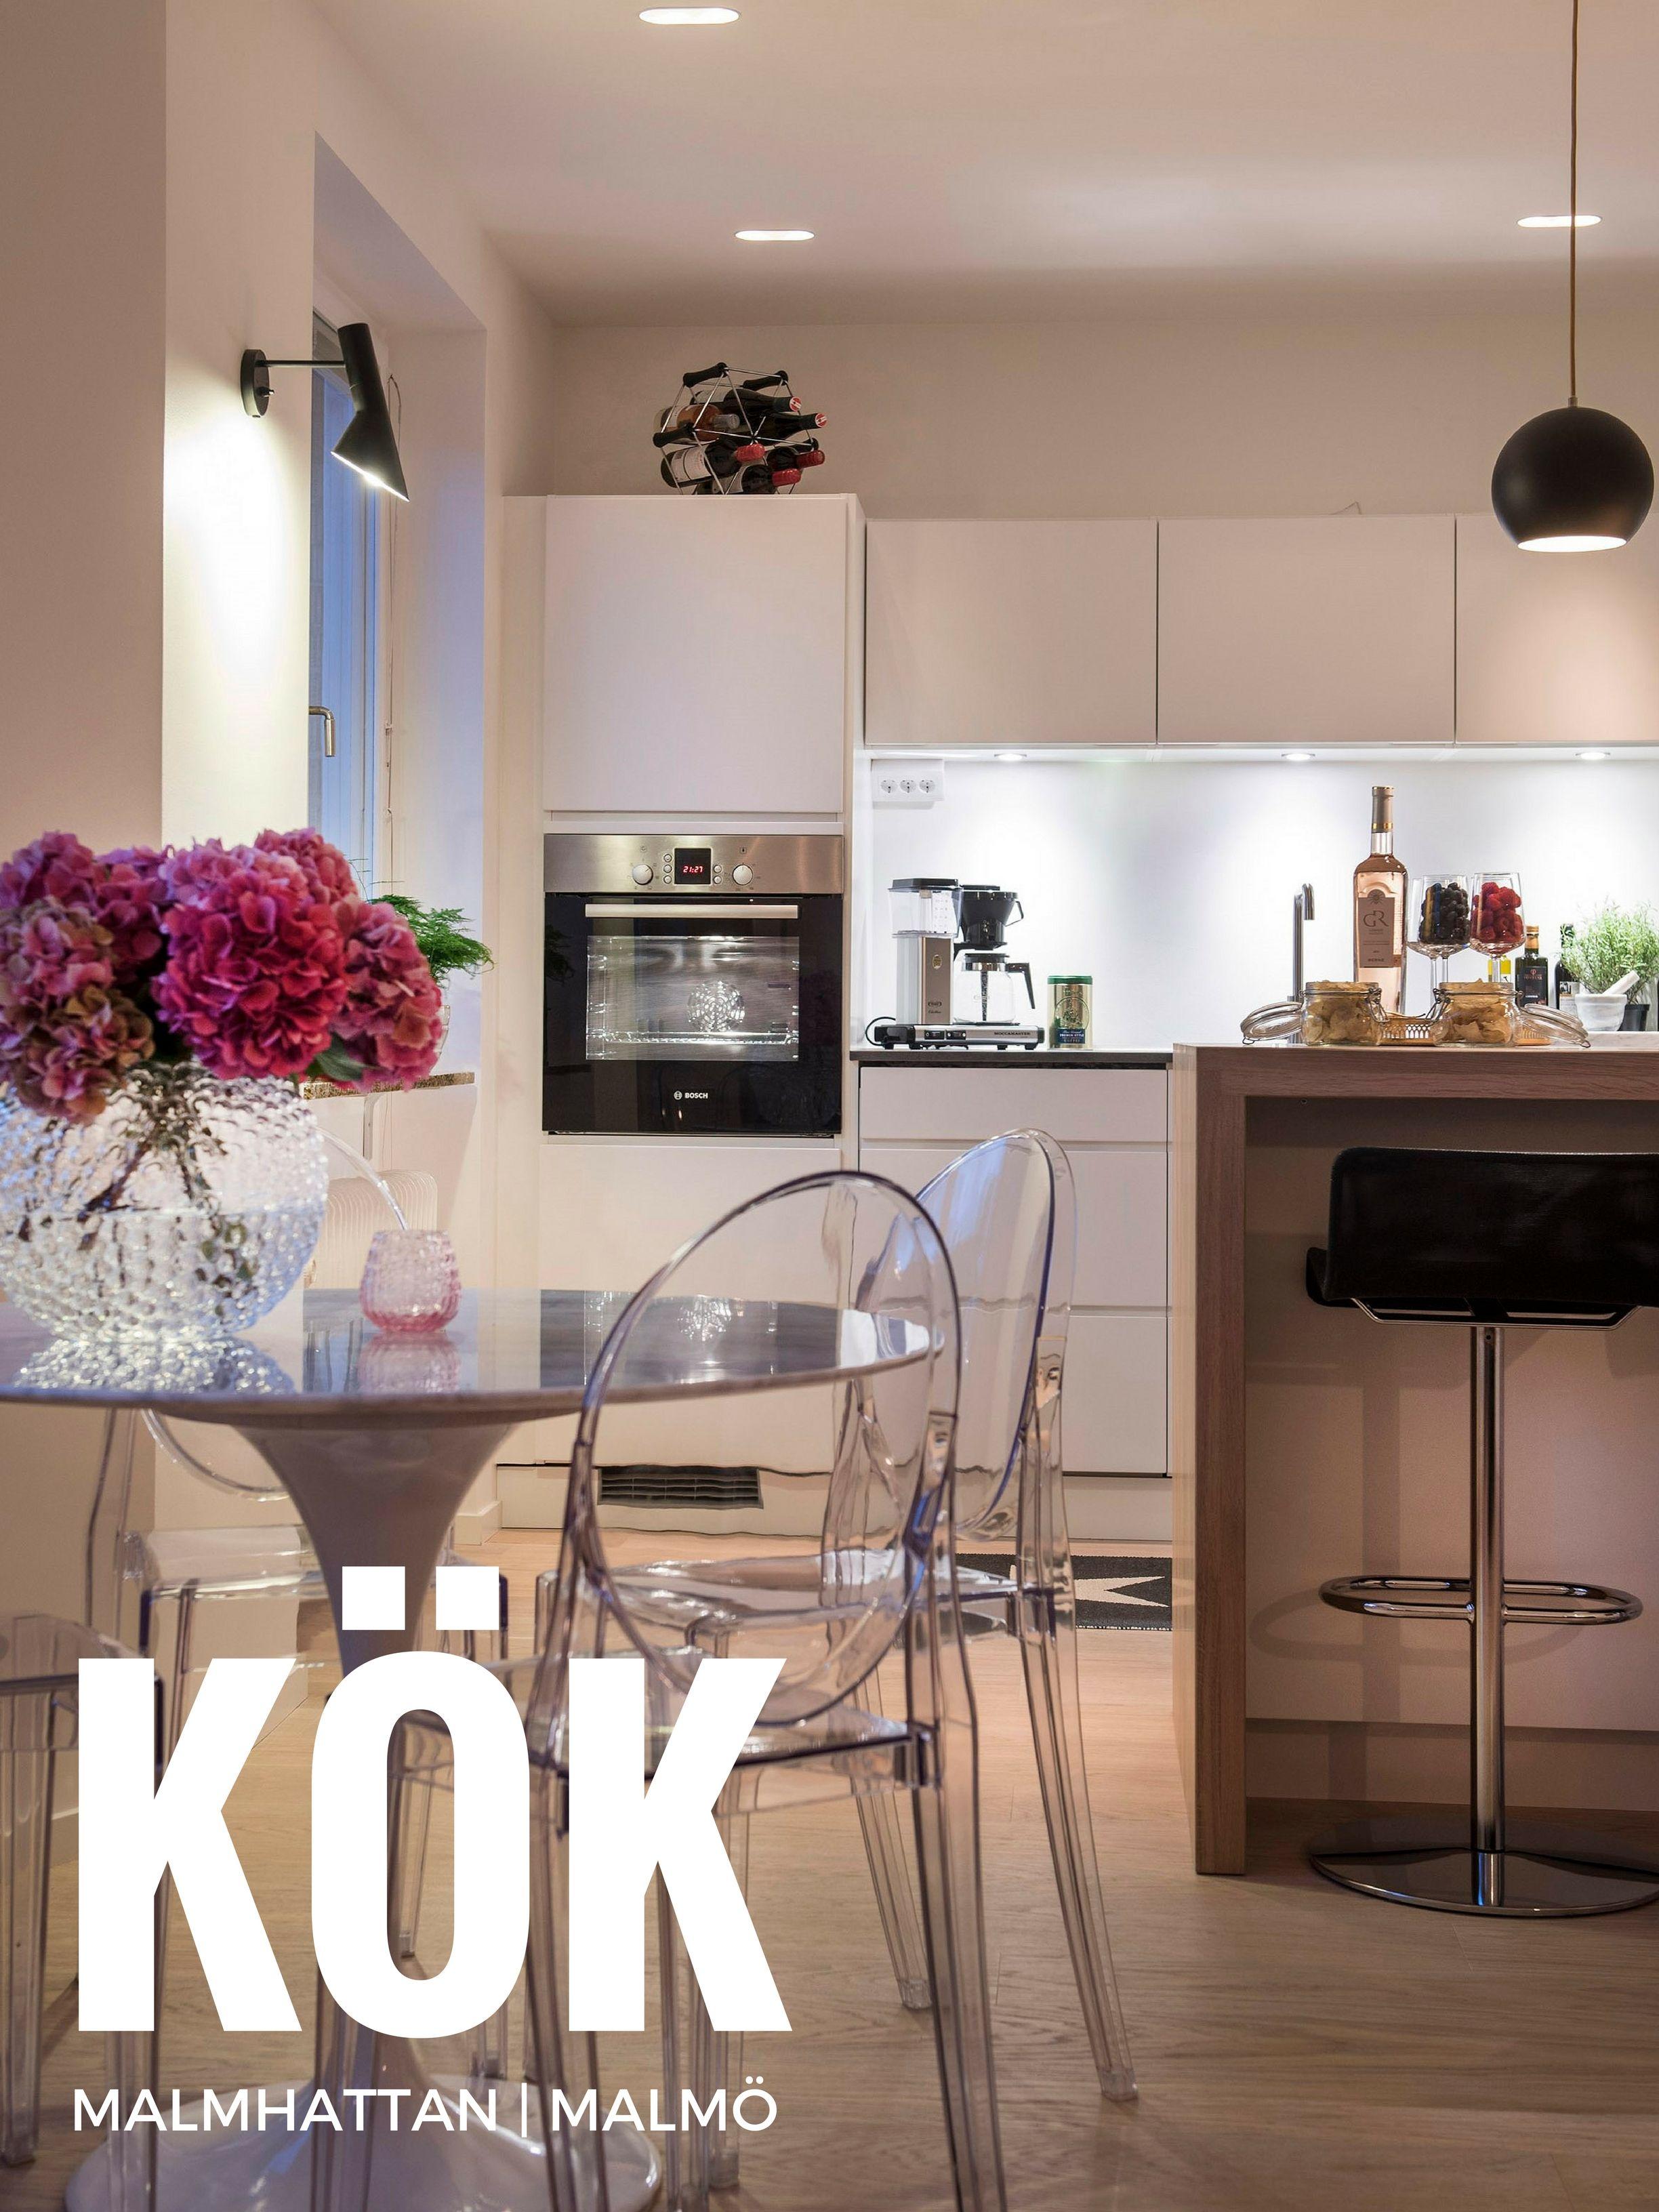 Kök malmhattan malmö credit homedoubler kitchen kitcheninspo